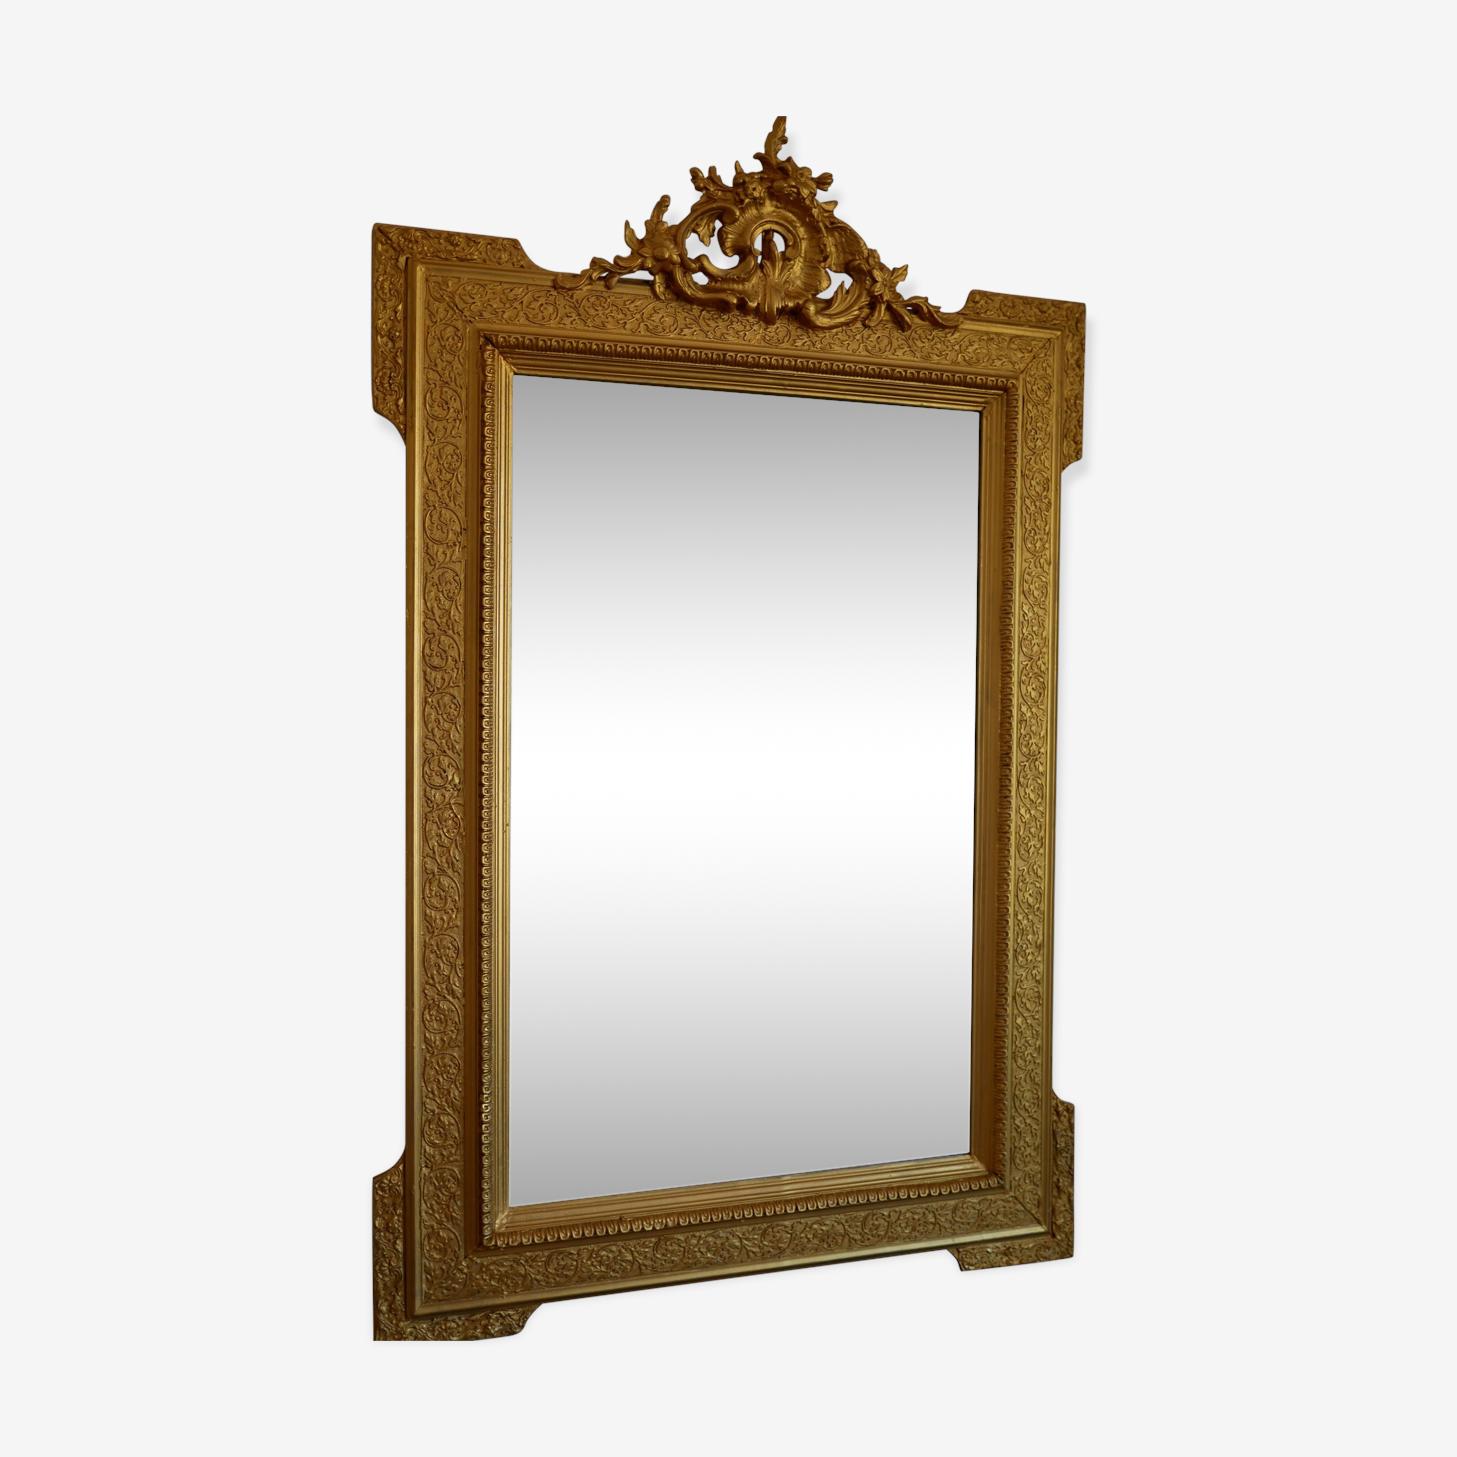 Old mirror wooden gold 120x75cm